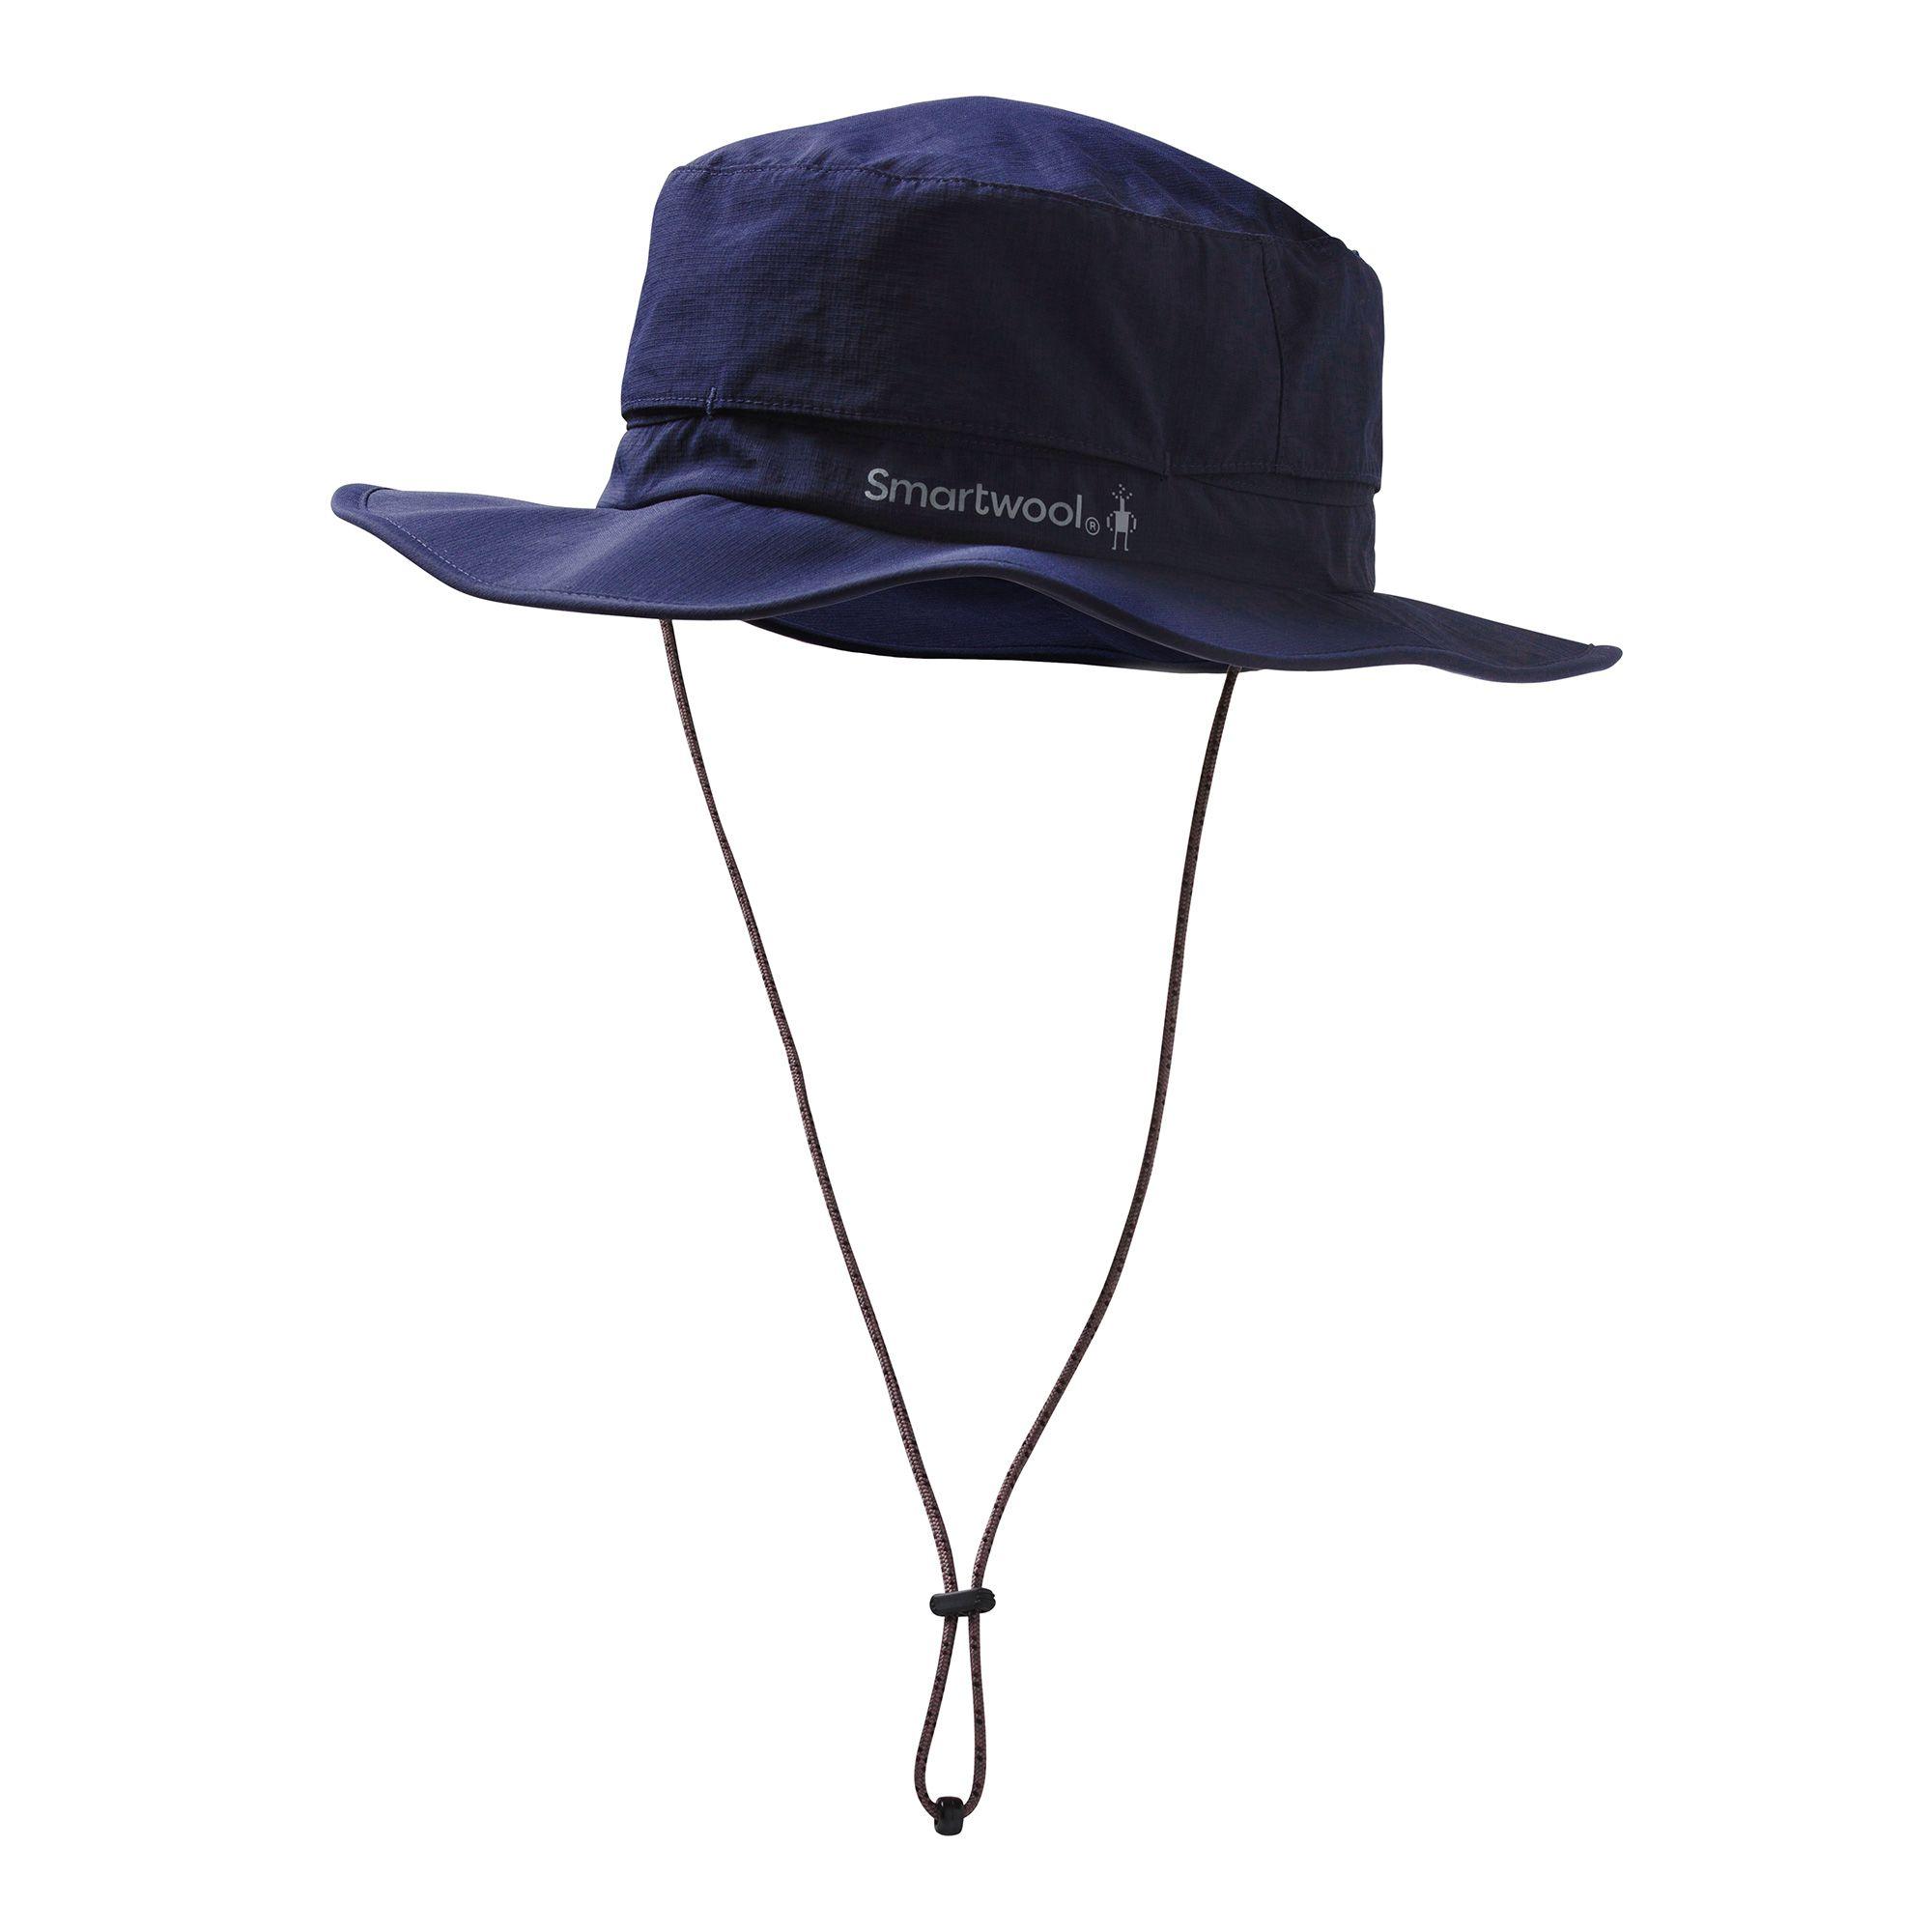 Chapeau protège-soleil Smartwool